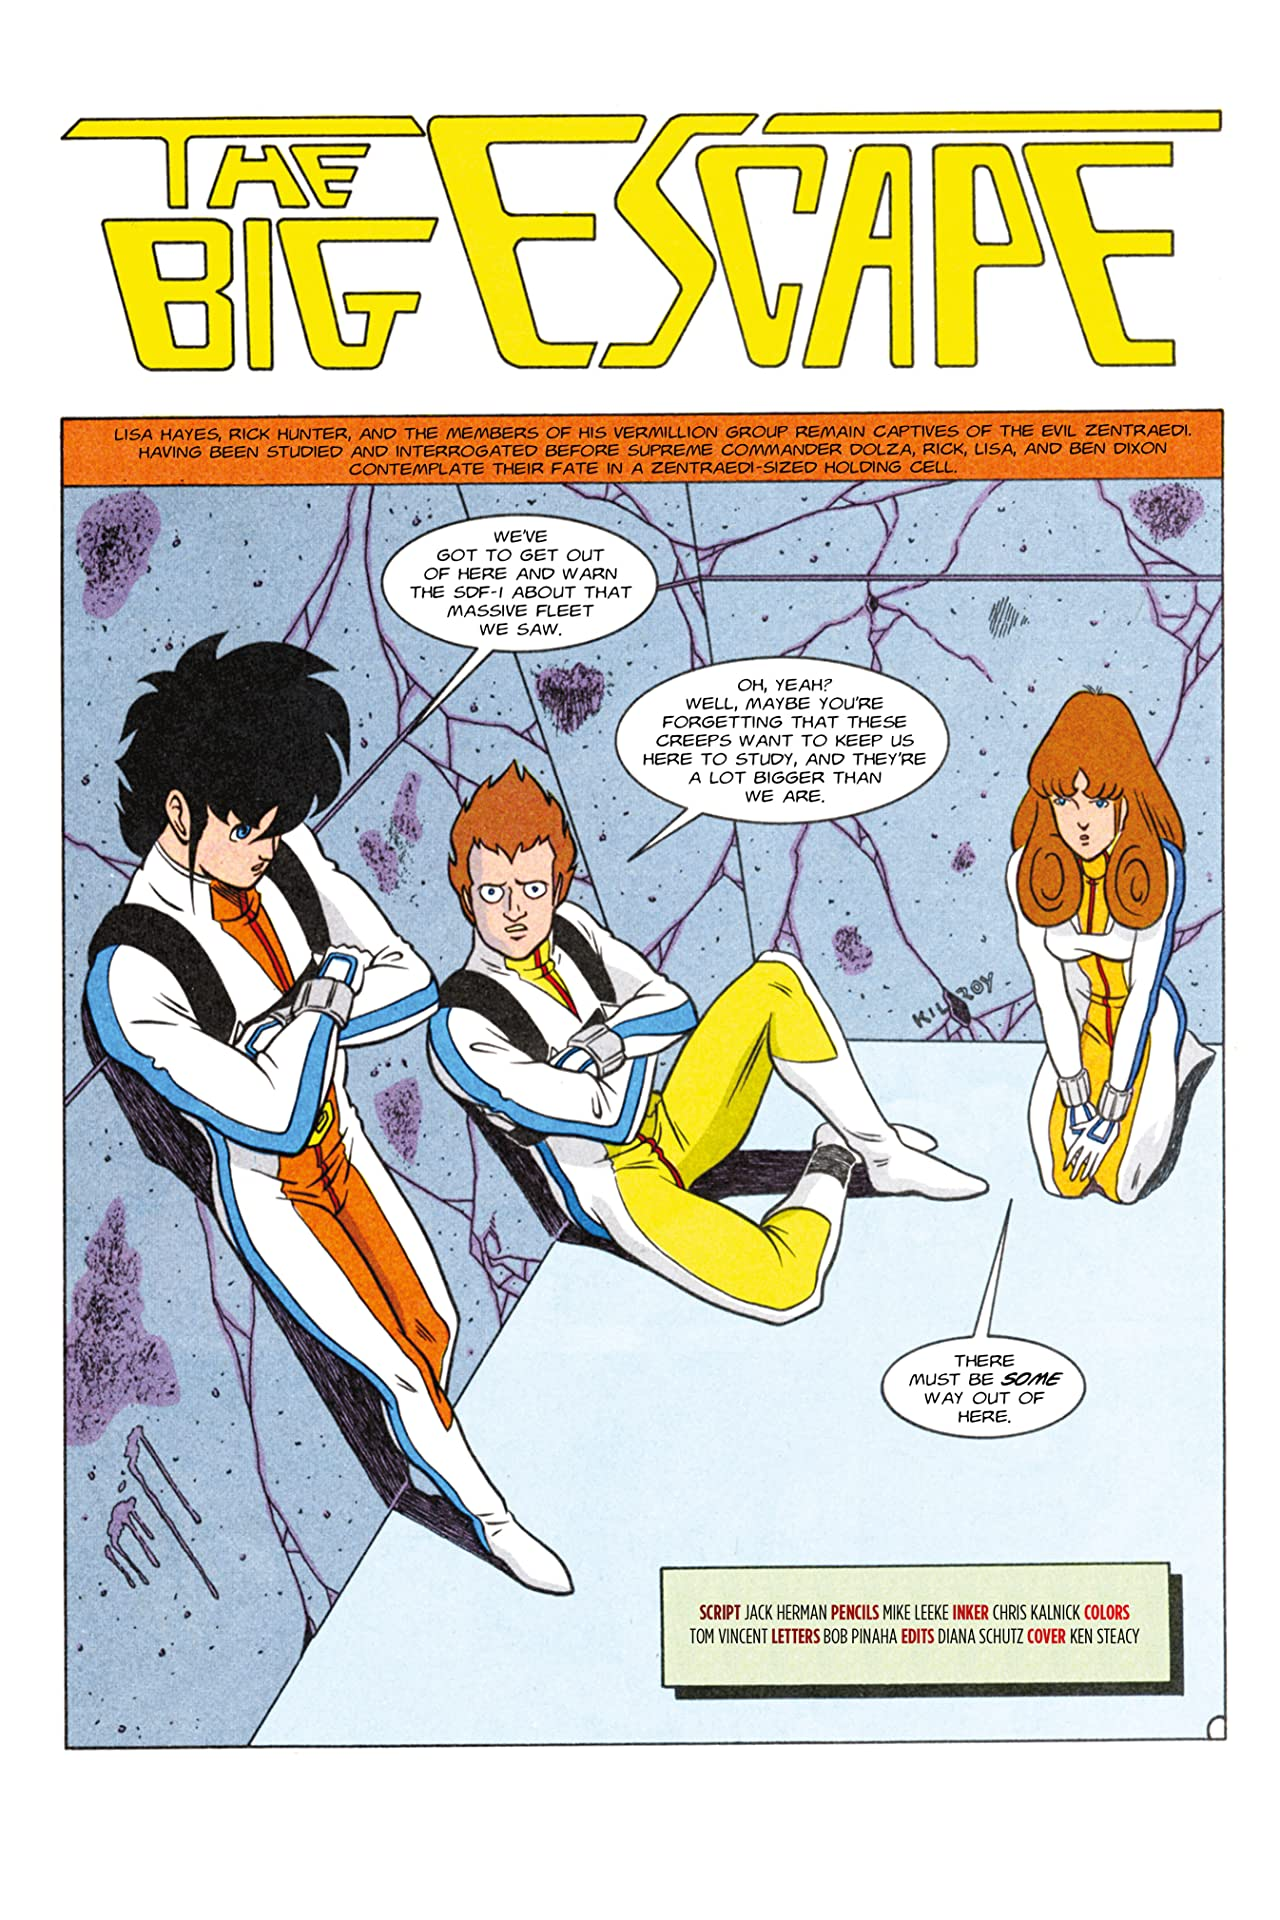 Robotech Archives: The Macross Saga Vol. 2